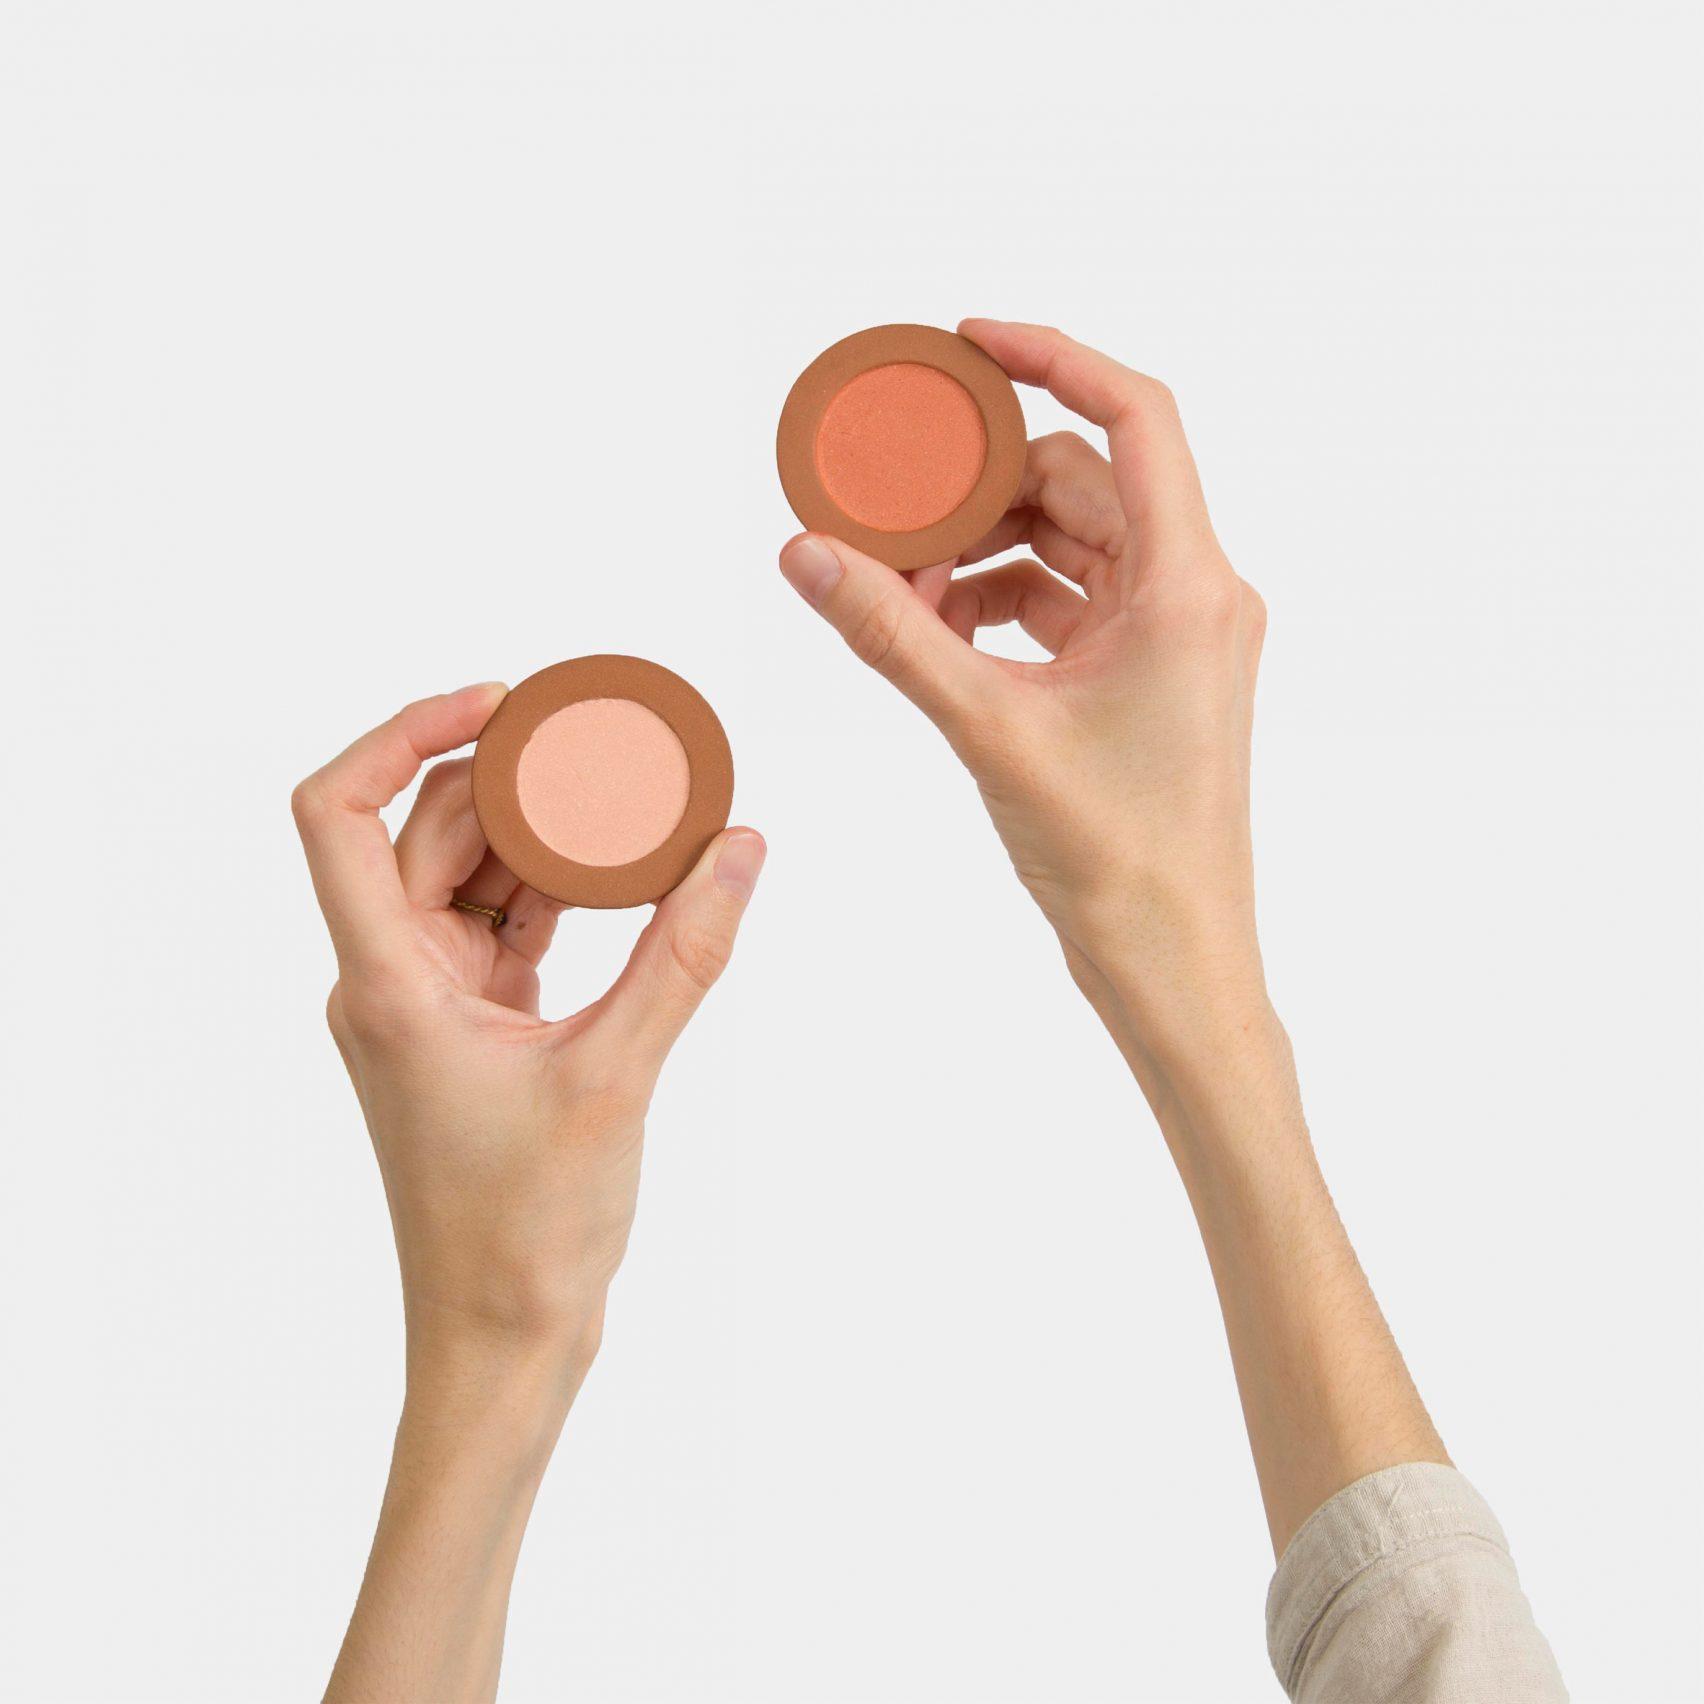 berber-lipstick-habibi-design-products-kim-ramain-colomb_dezeen_2364_col_6-1704x1704